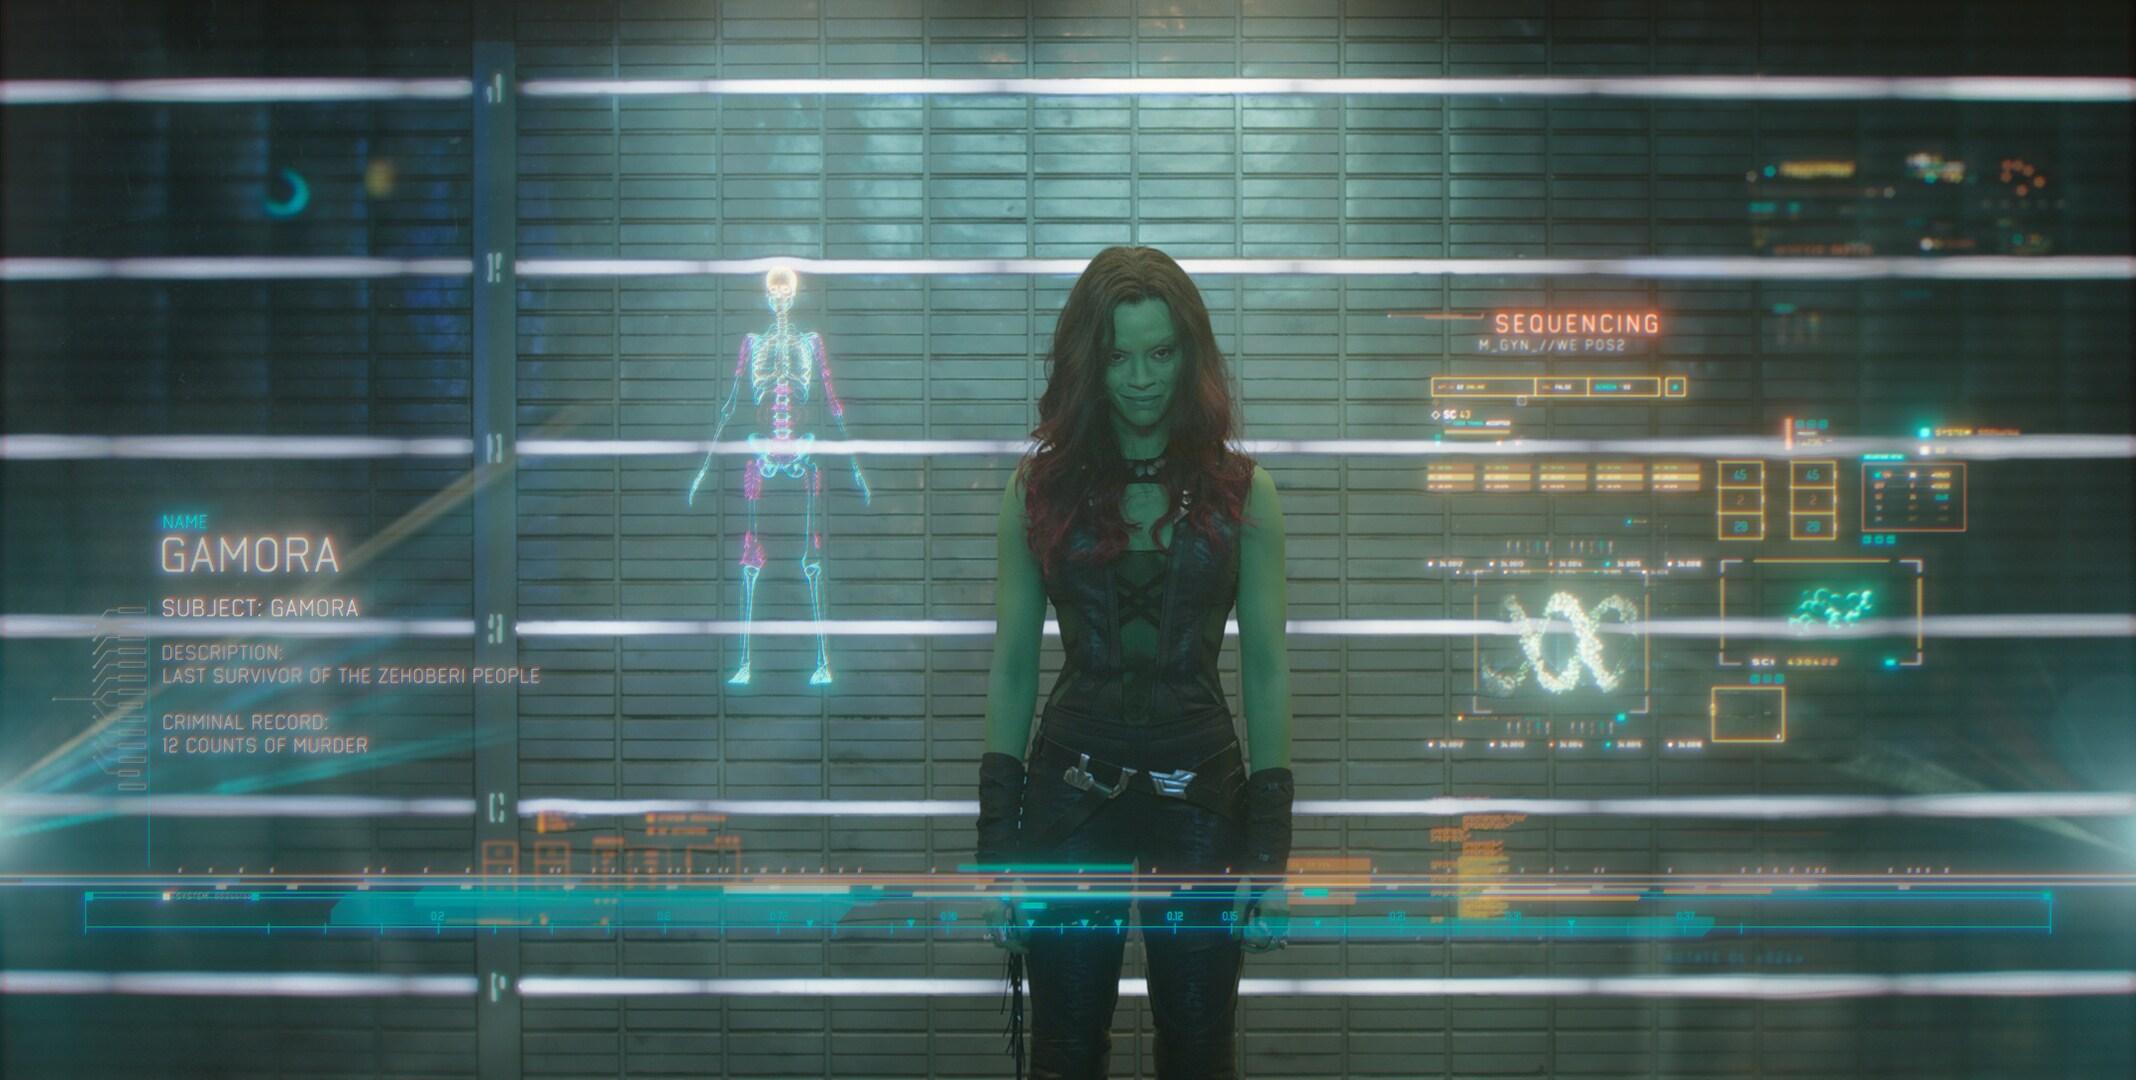 Zoe Saldana as Gamora in the movie Guardians of the Galaxy